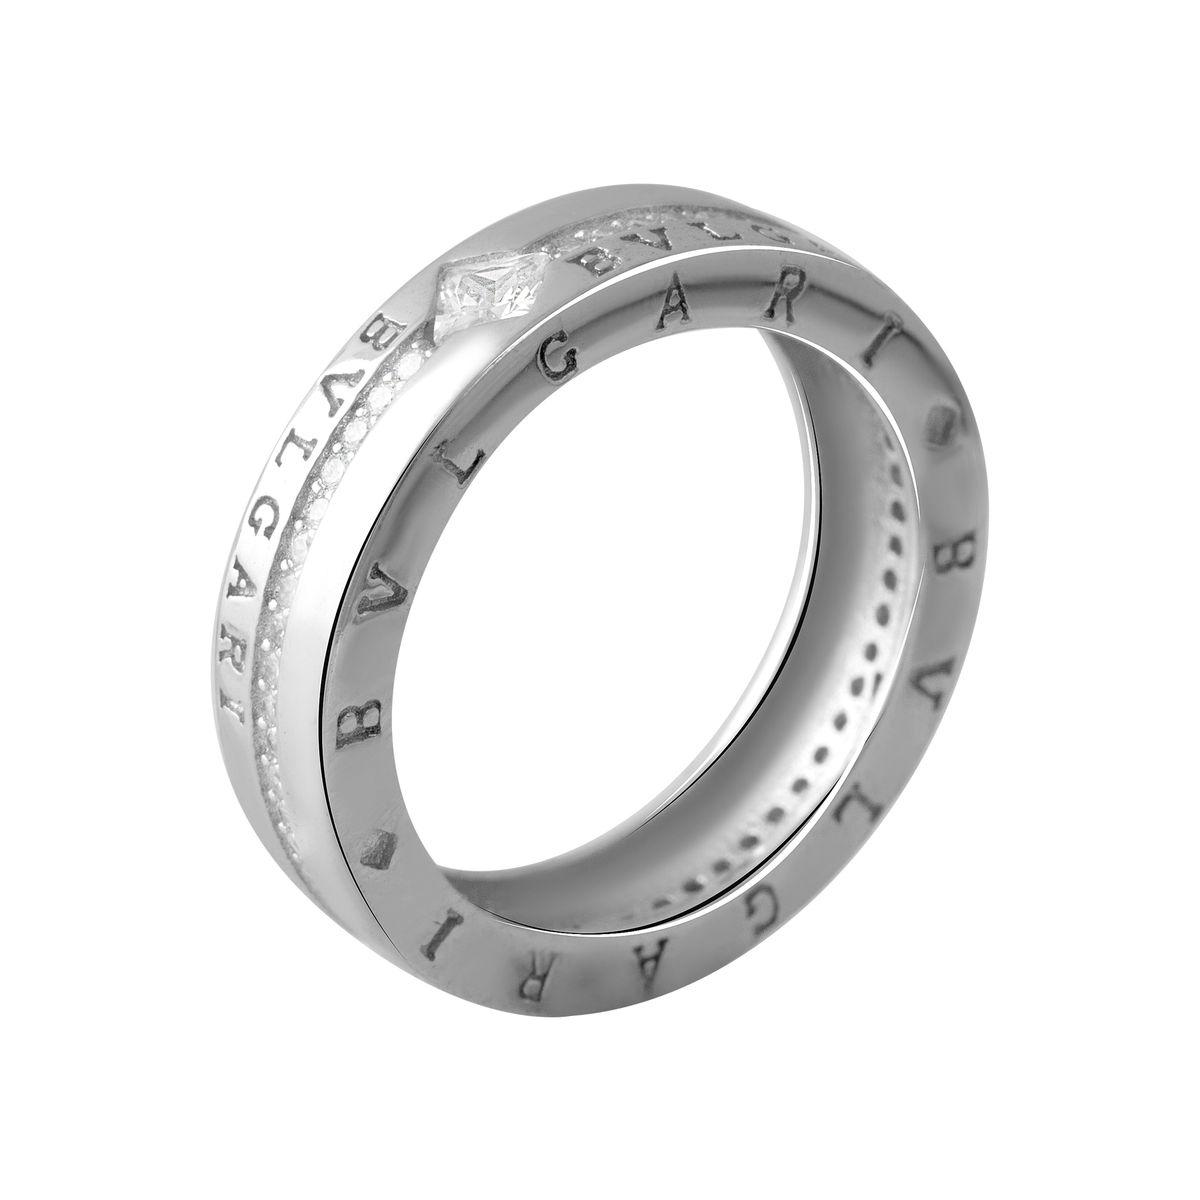 Серебряное кольцо DreamJewelry с фианитами (2048299) 18 размер